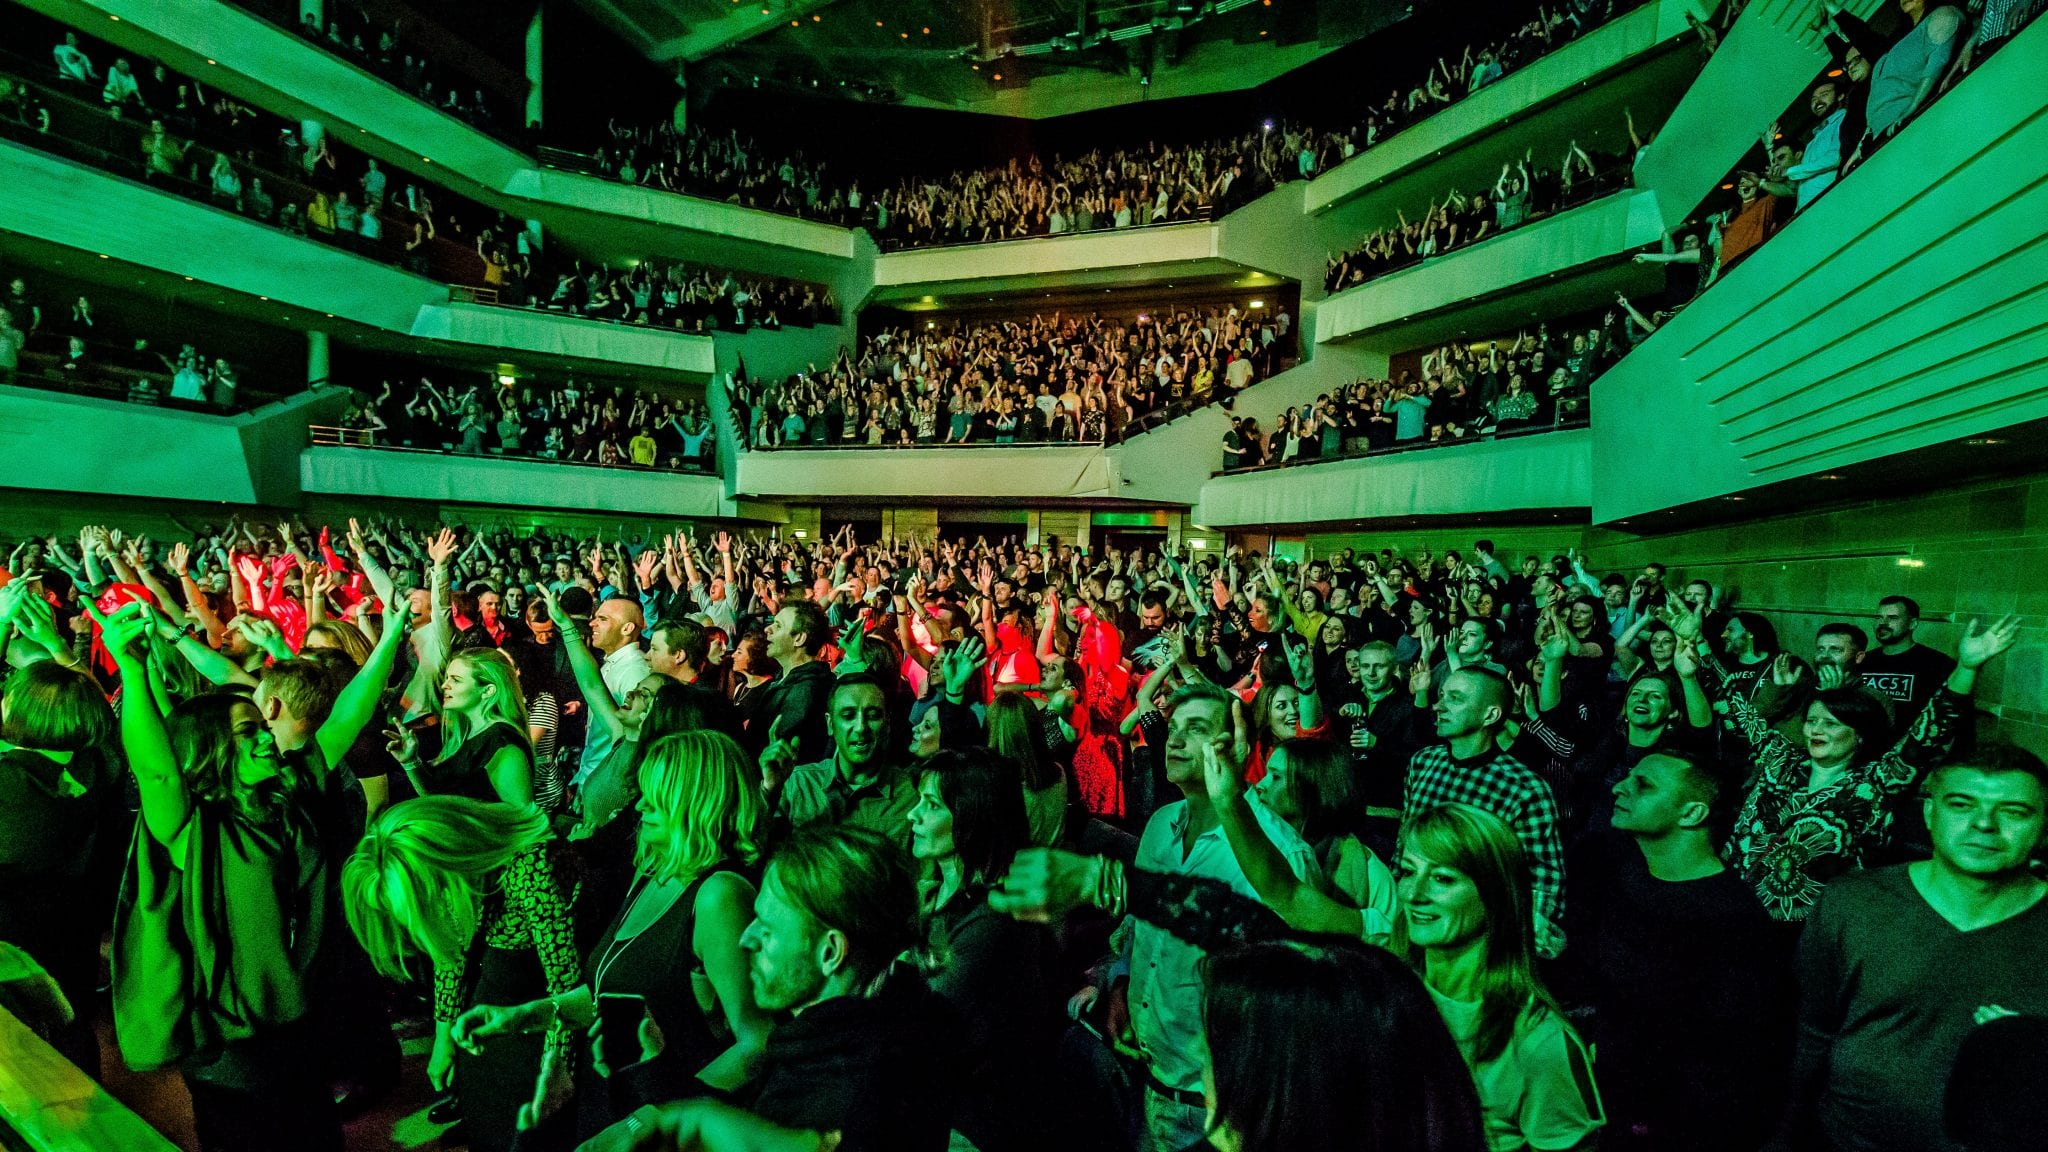 Haçienda Classical Will Bring Classic Club Anthems to Lytham Festival 2017